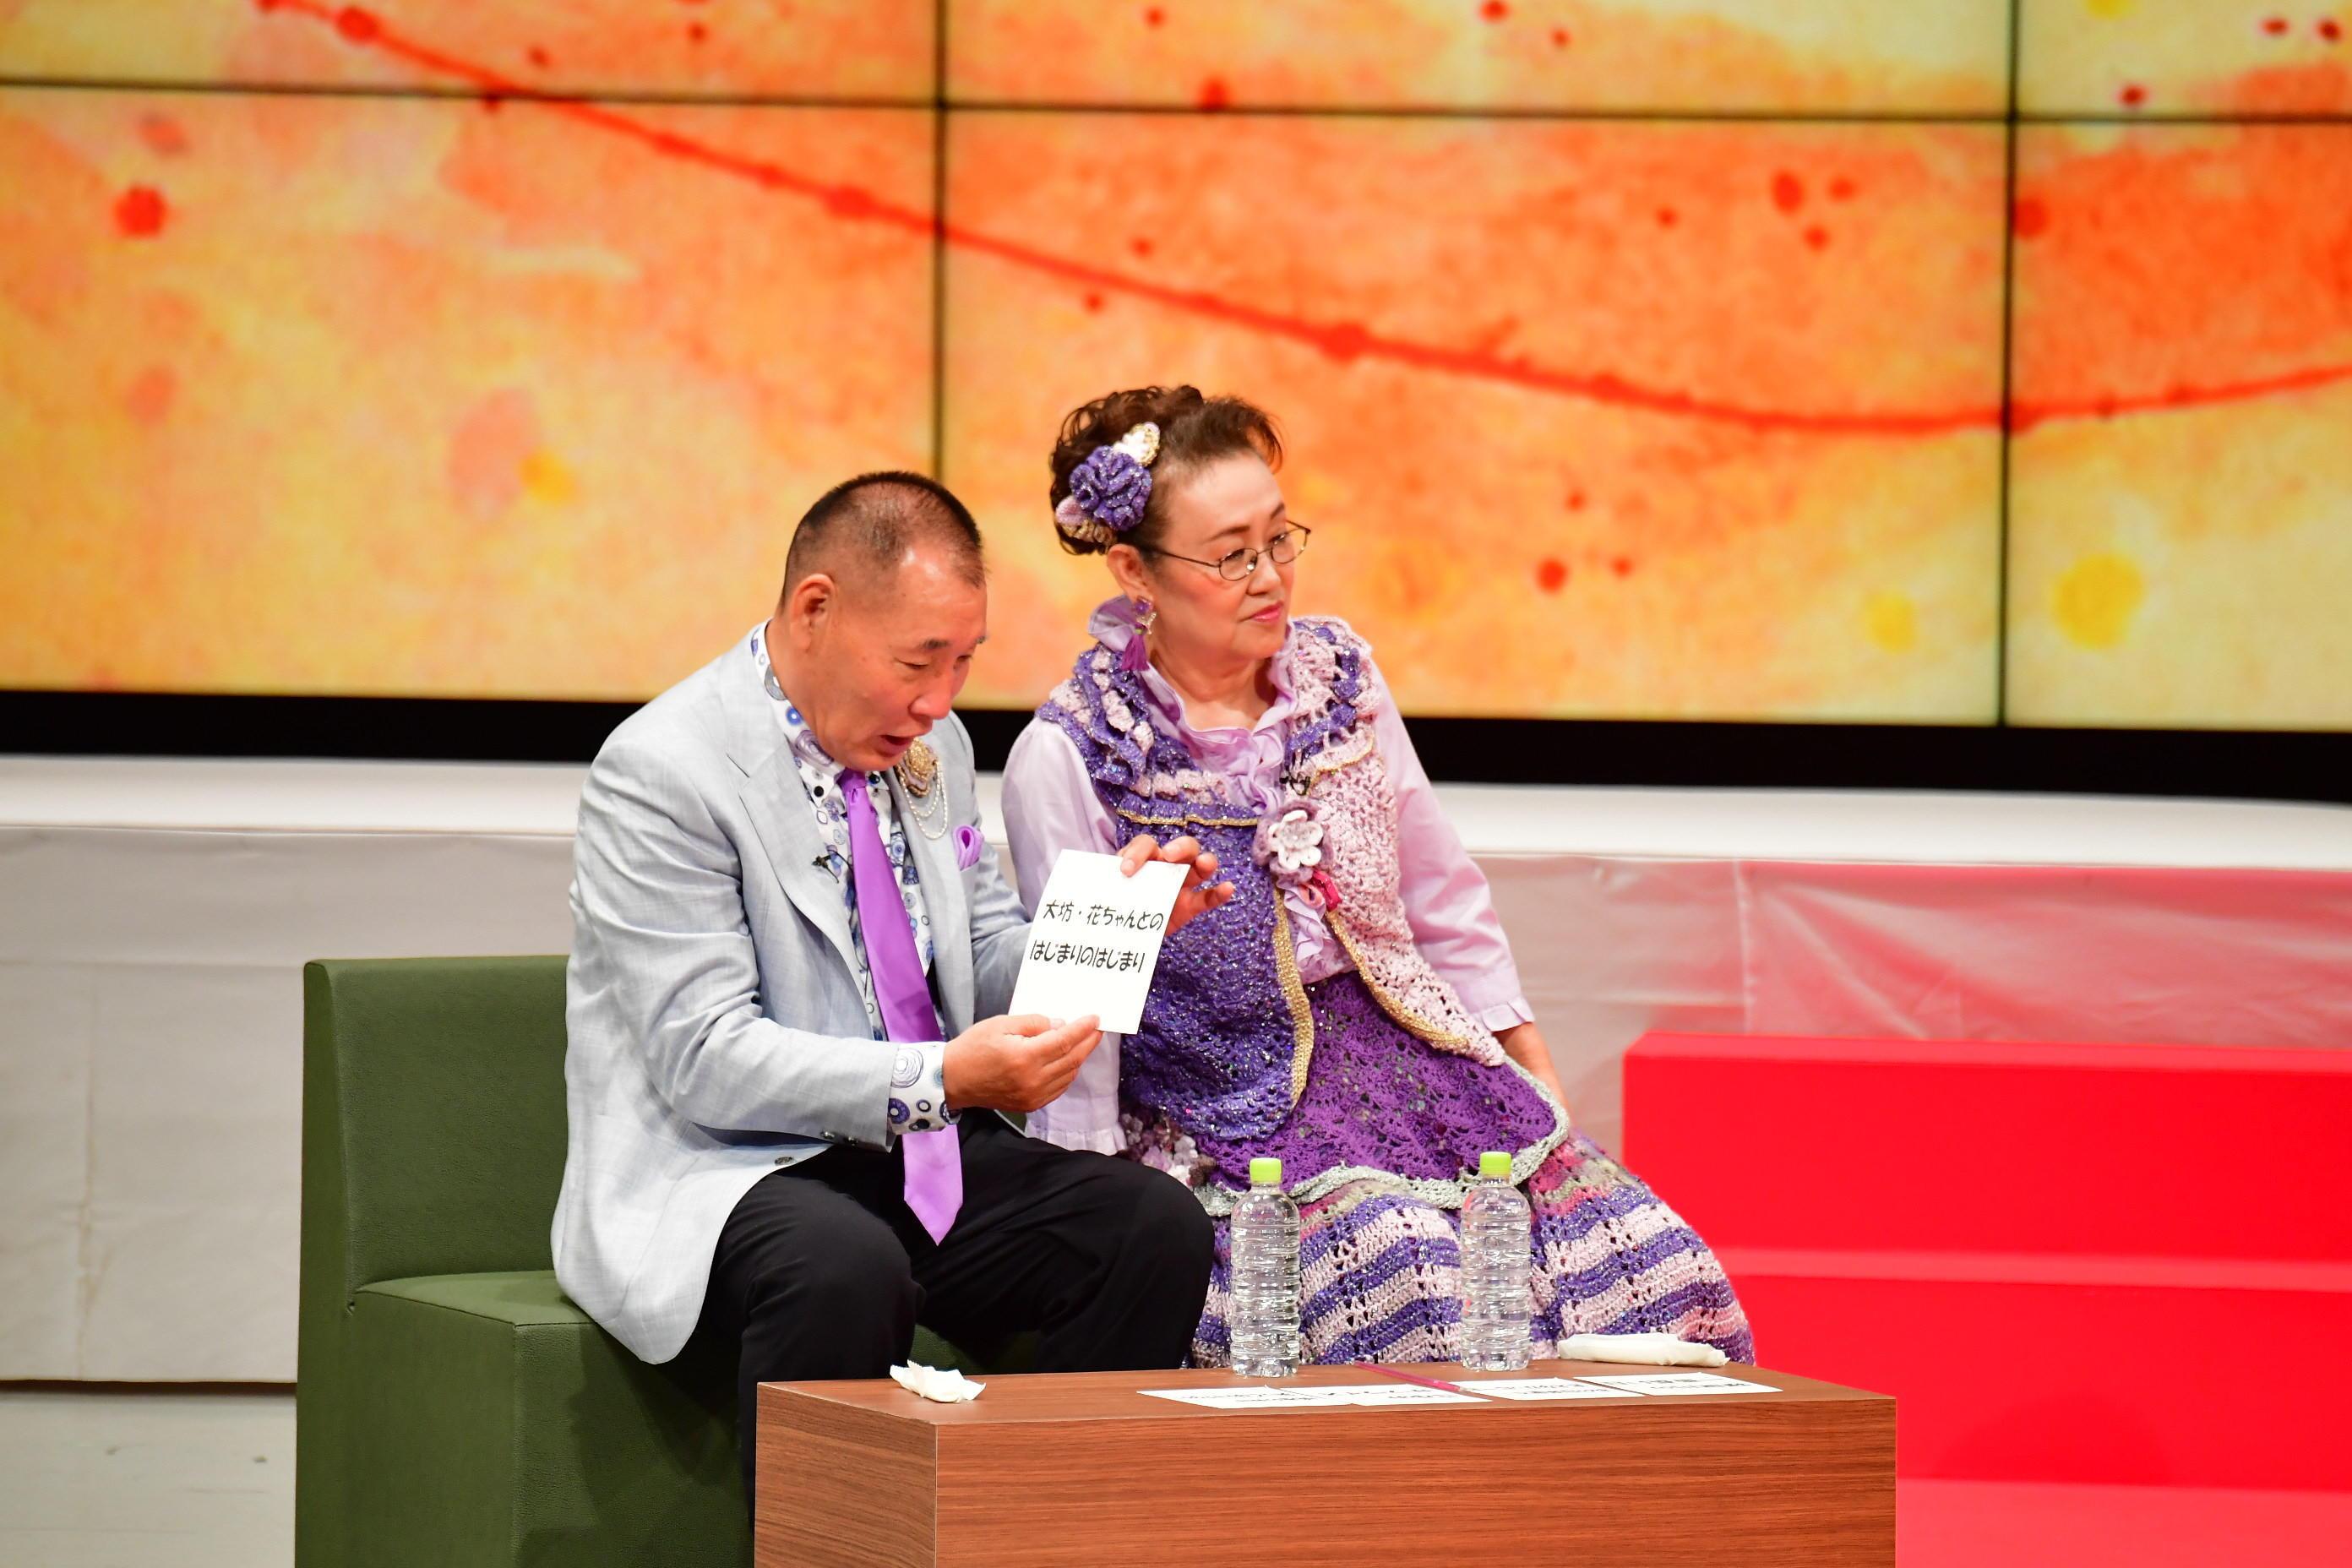 http://news.yoshimoto.co.jp/20180402070640-2ac01c53aecaf9f0ac061b8f35fbbaa999c9e368.jpg